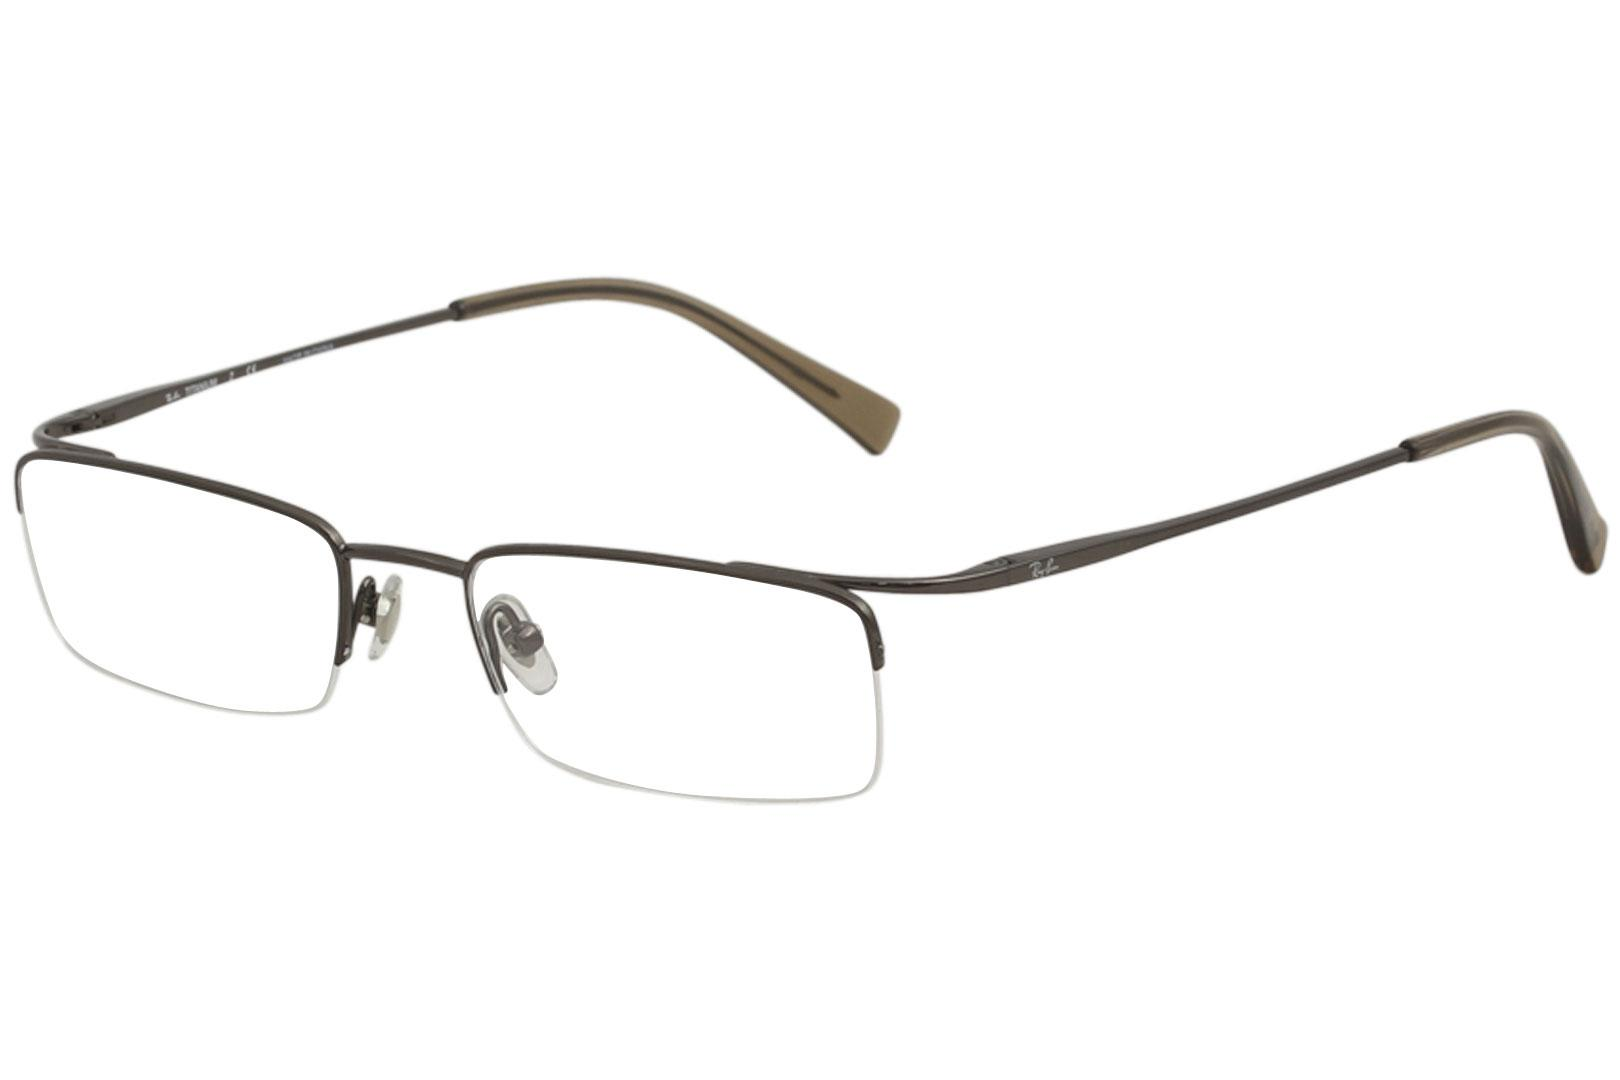 13f4603d735f Ray Ban Men's Eyeglasses RX8582 RX/8582 RayBan Half Rim Titanium Optical  Frame by Ray Ban